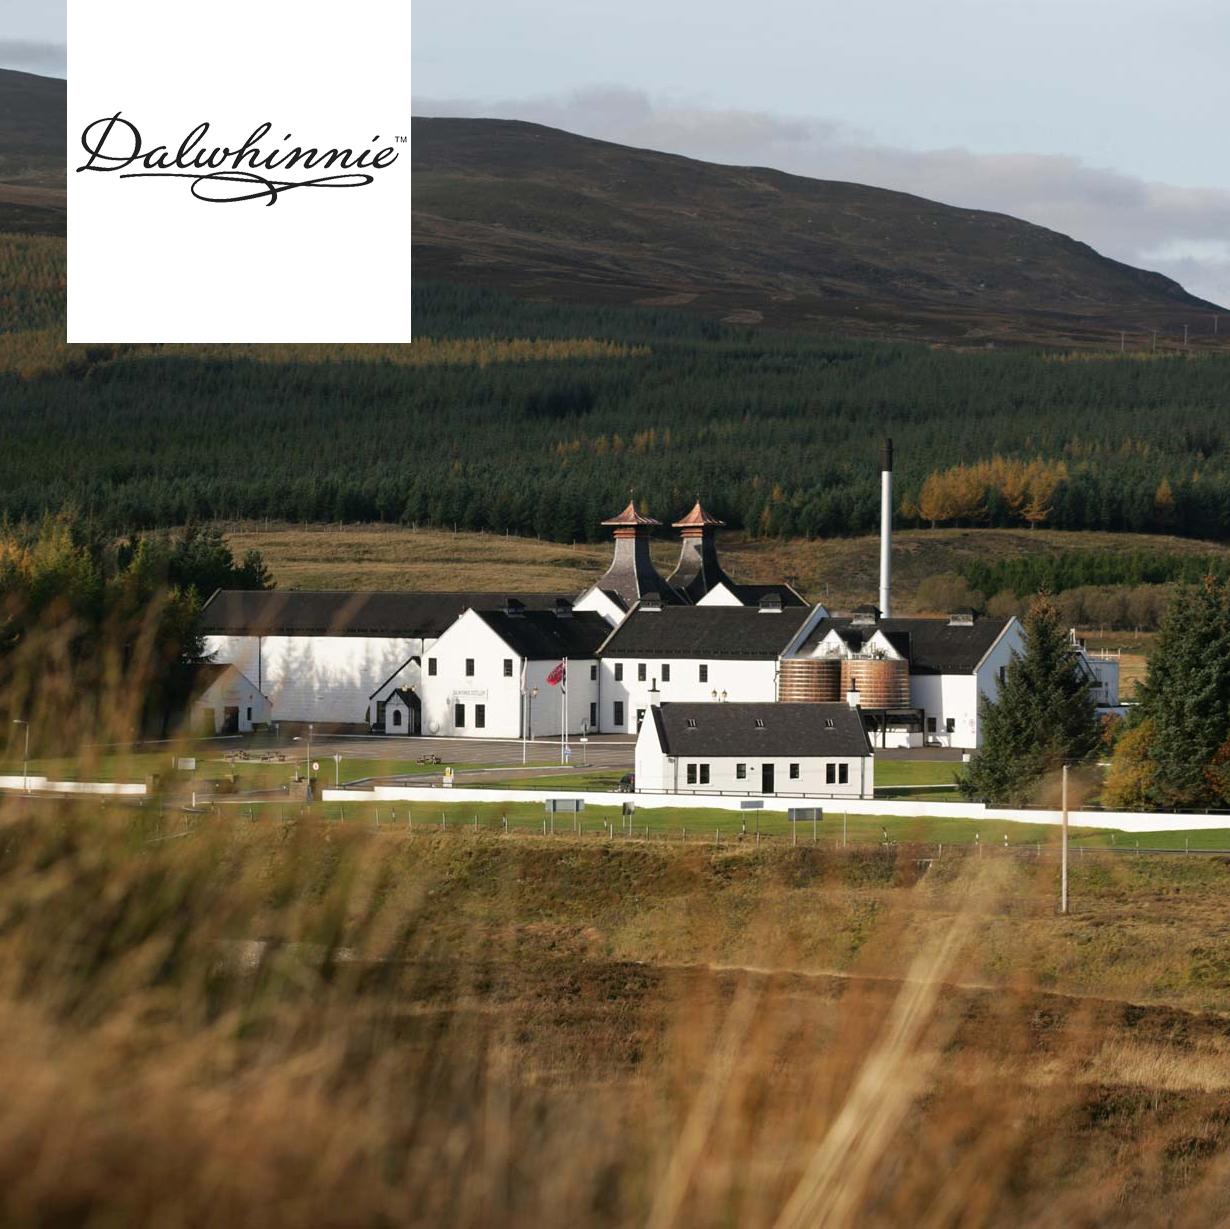 Soillerie-House-Self-Catering-Cottage-Cairngoms-Highlands-_Dalwhinnie-Distillery.jpg